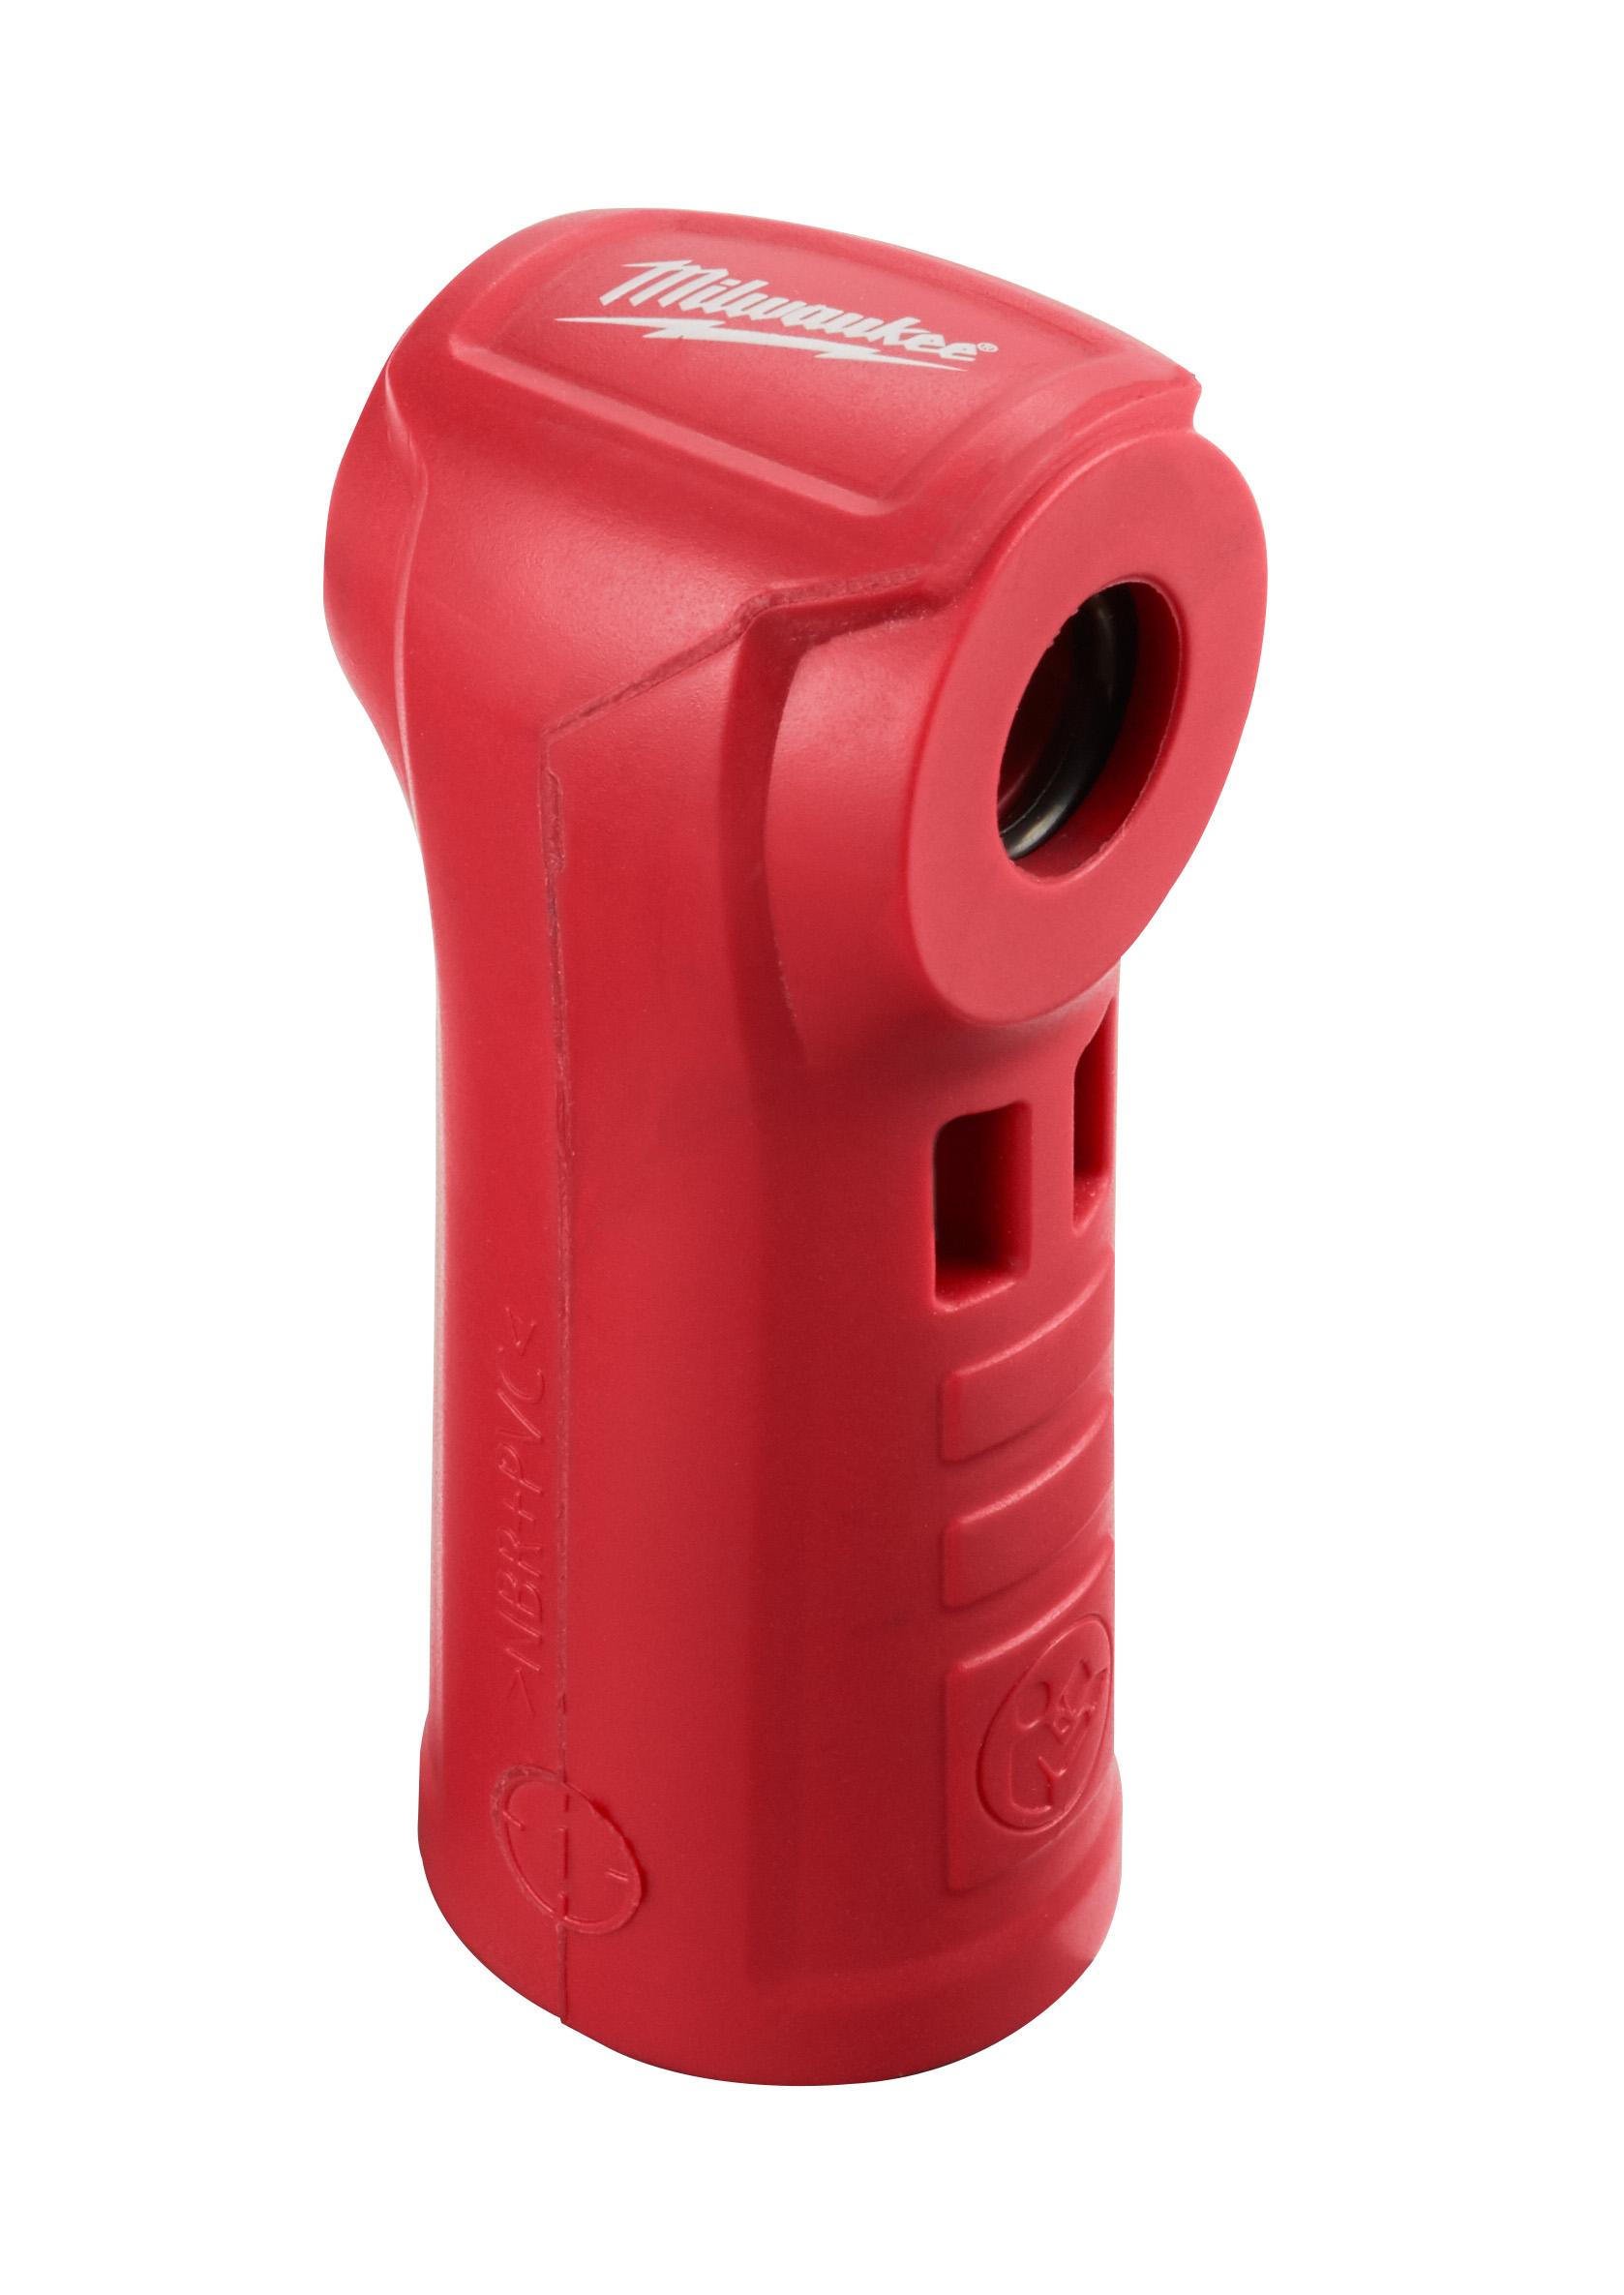 Milwaukee® 48-20-2100 Vacuum Bit Adapter, 6-1/4 in OAL, SDS-Plus Shank